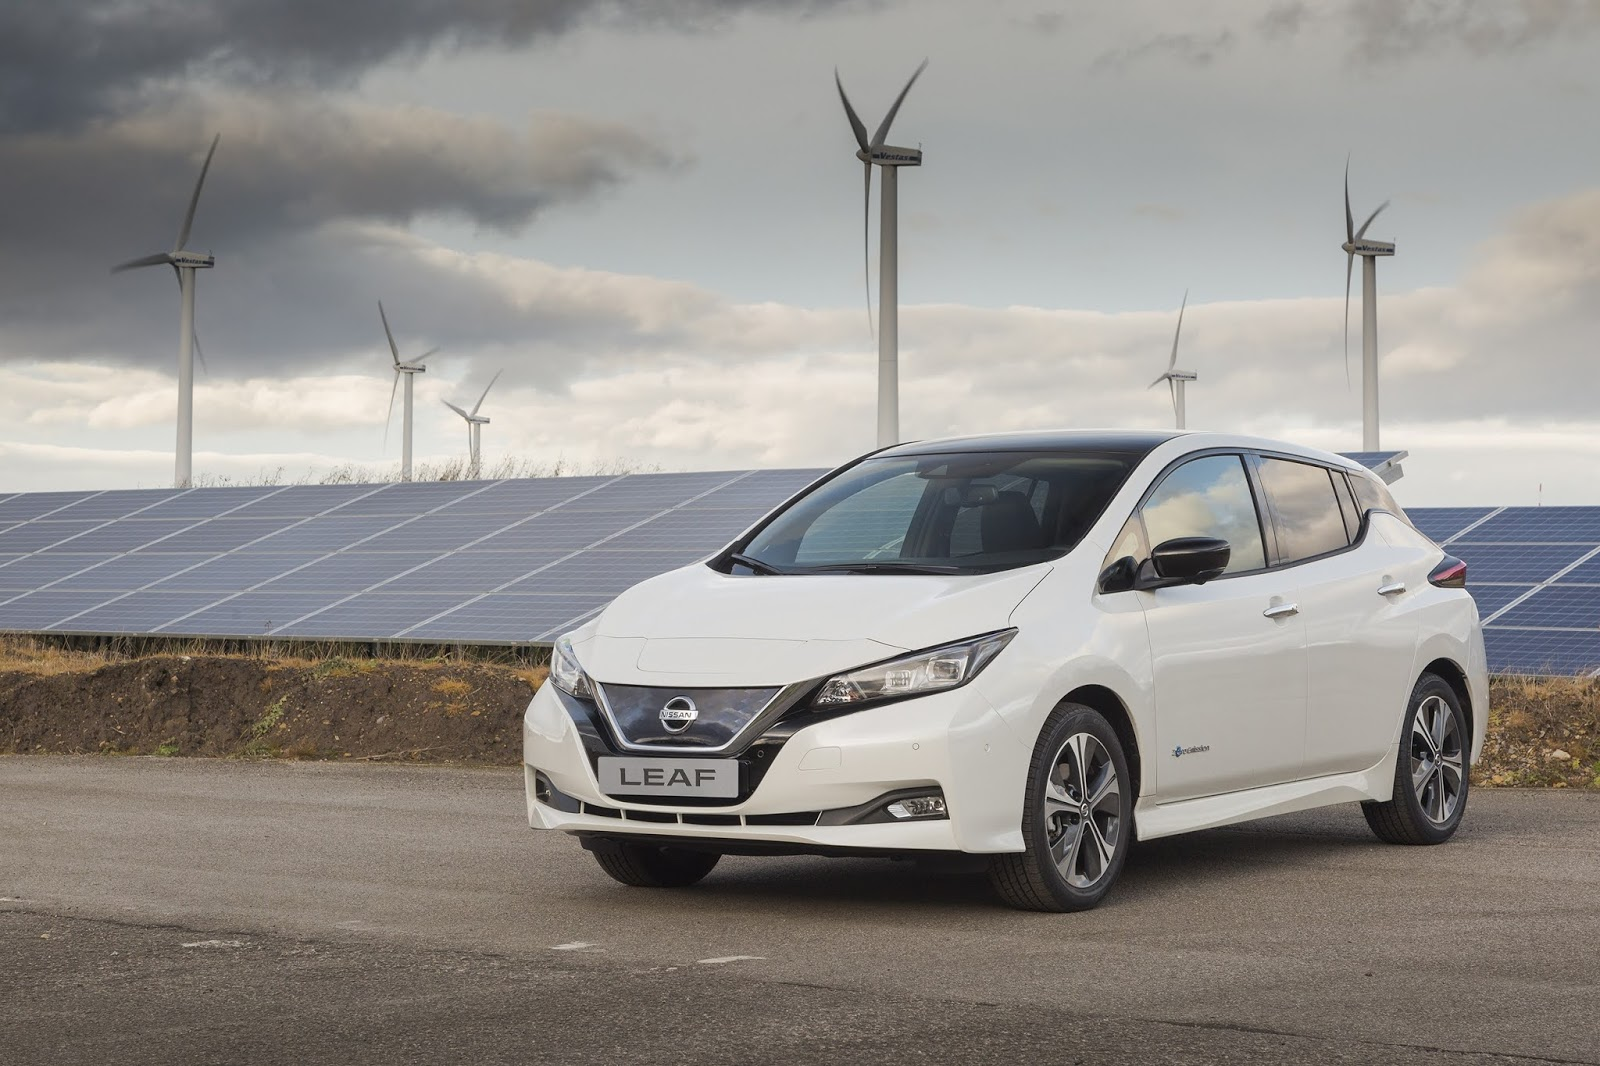 NMUK2Brenewables2B1 Nissan : Σχεδιάζει μεγάλη επέκταση του πάρκου ανανεώσιμων πηγών ενέργειας στο εργοστάσιο του Sunderland